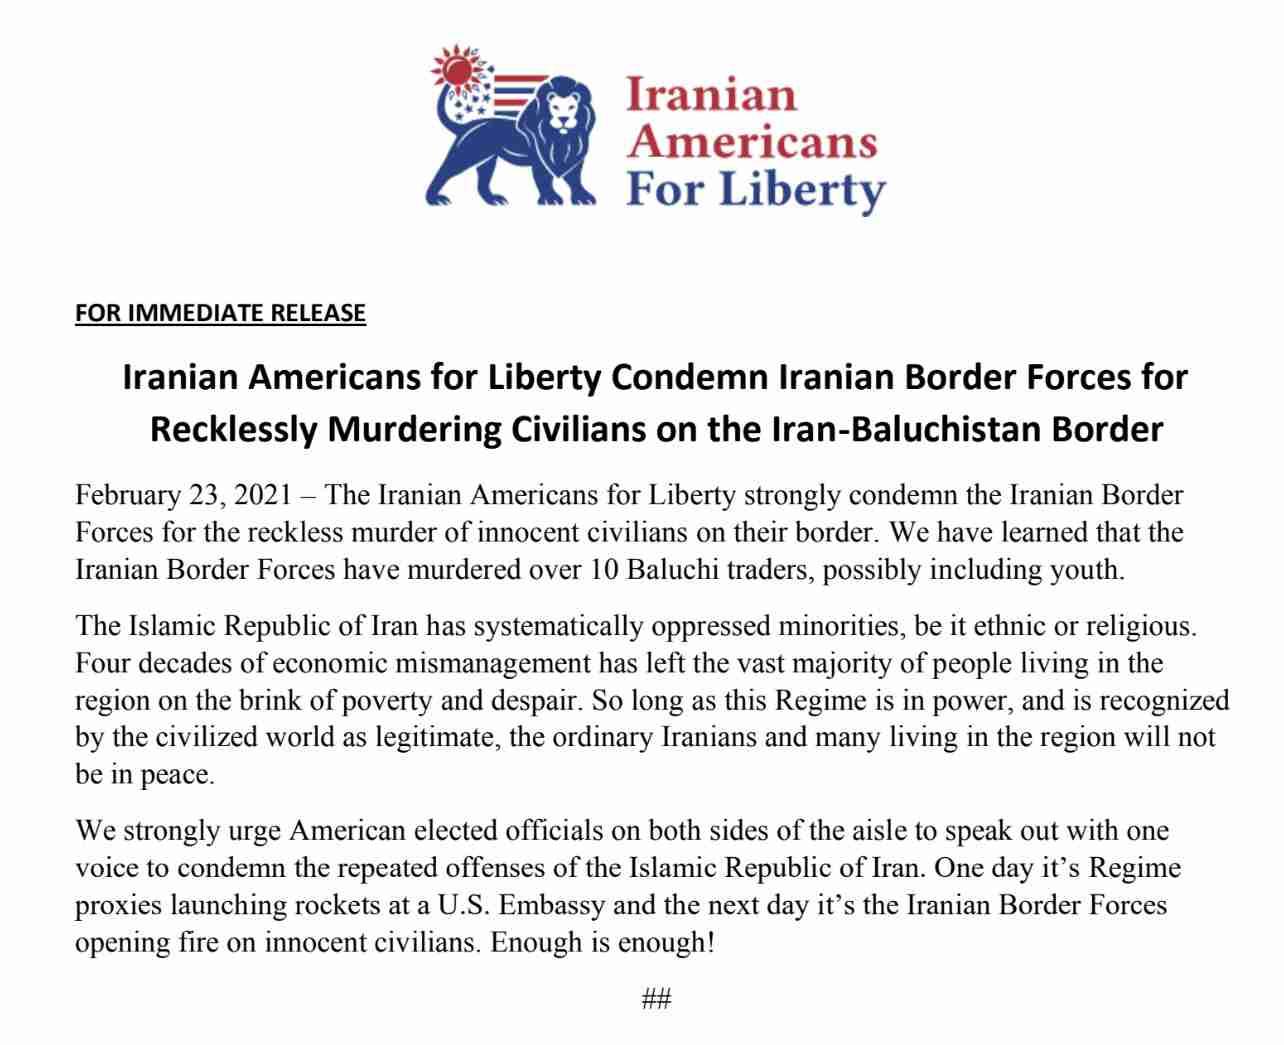 Iranian Americans For Liberty Condemn The Killing Of Civilians On Iran-Baluchistan Border